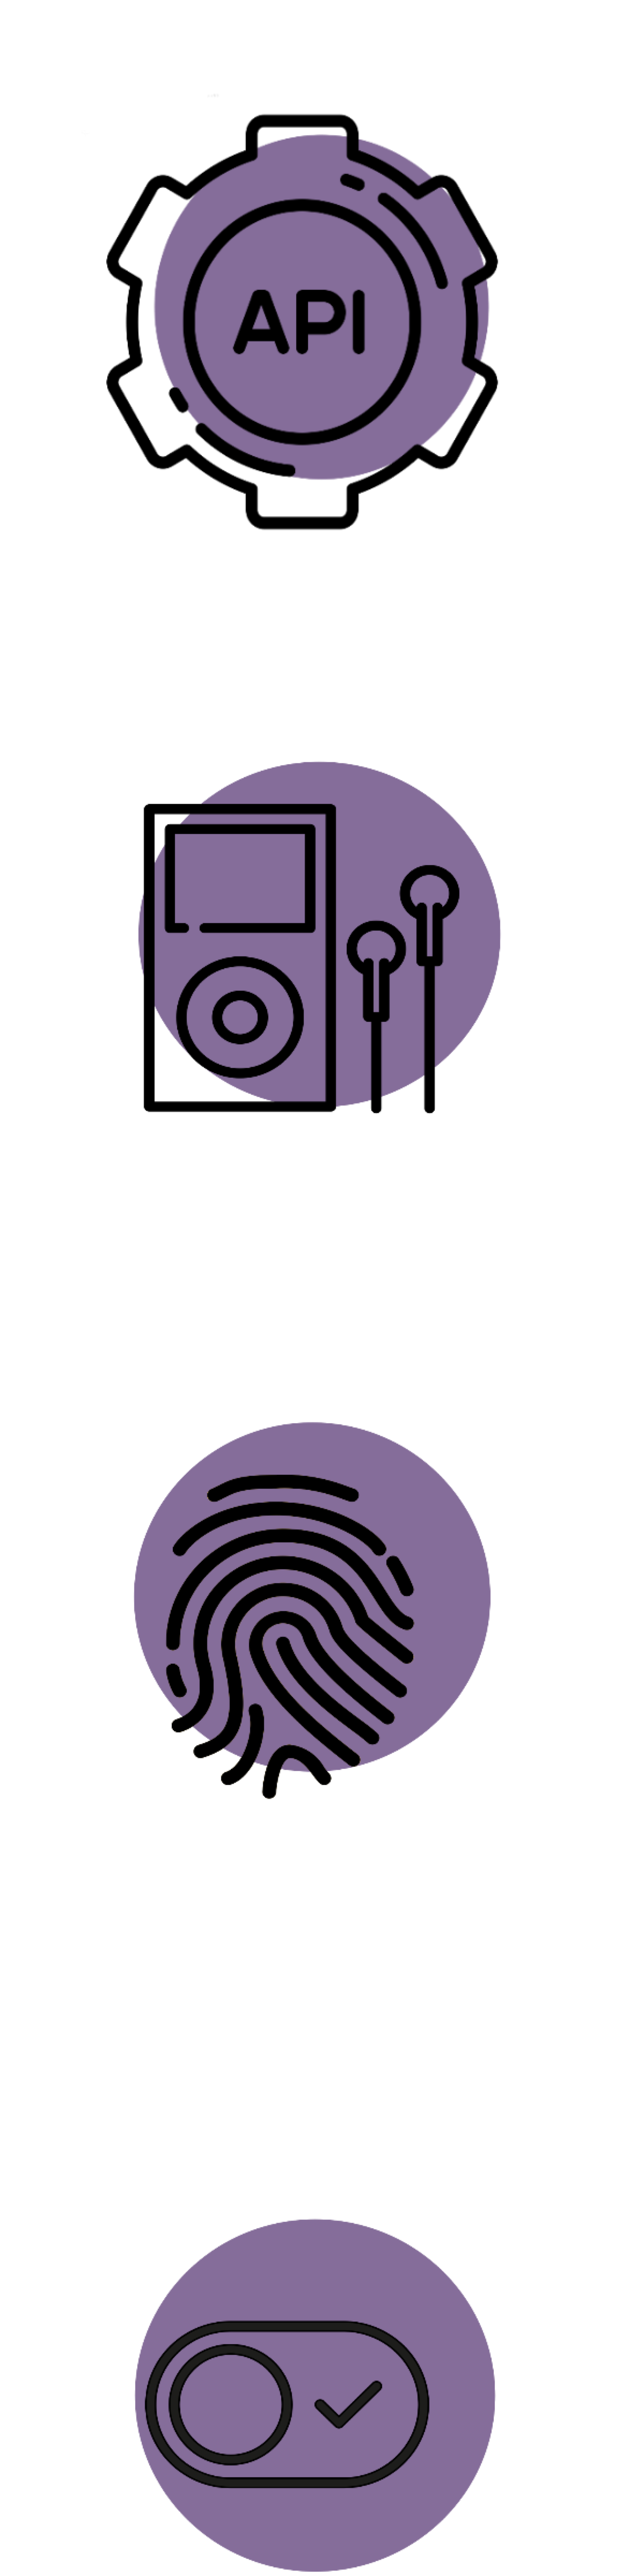 nudle s ikonkama_purple.png